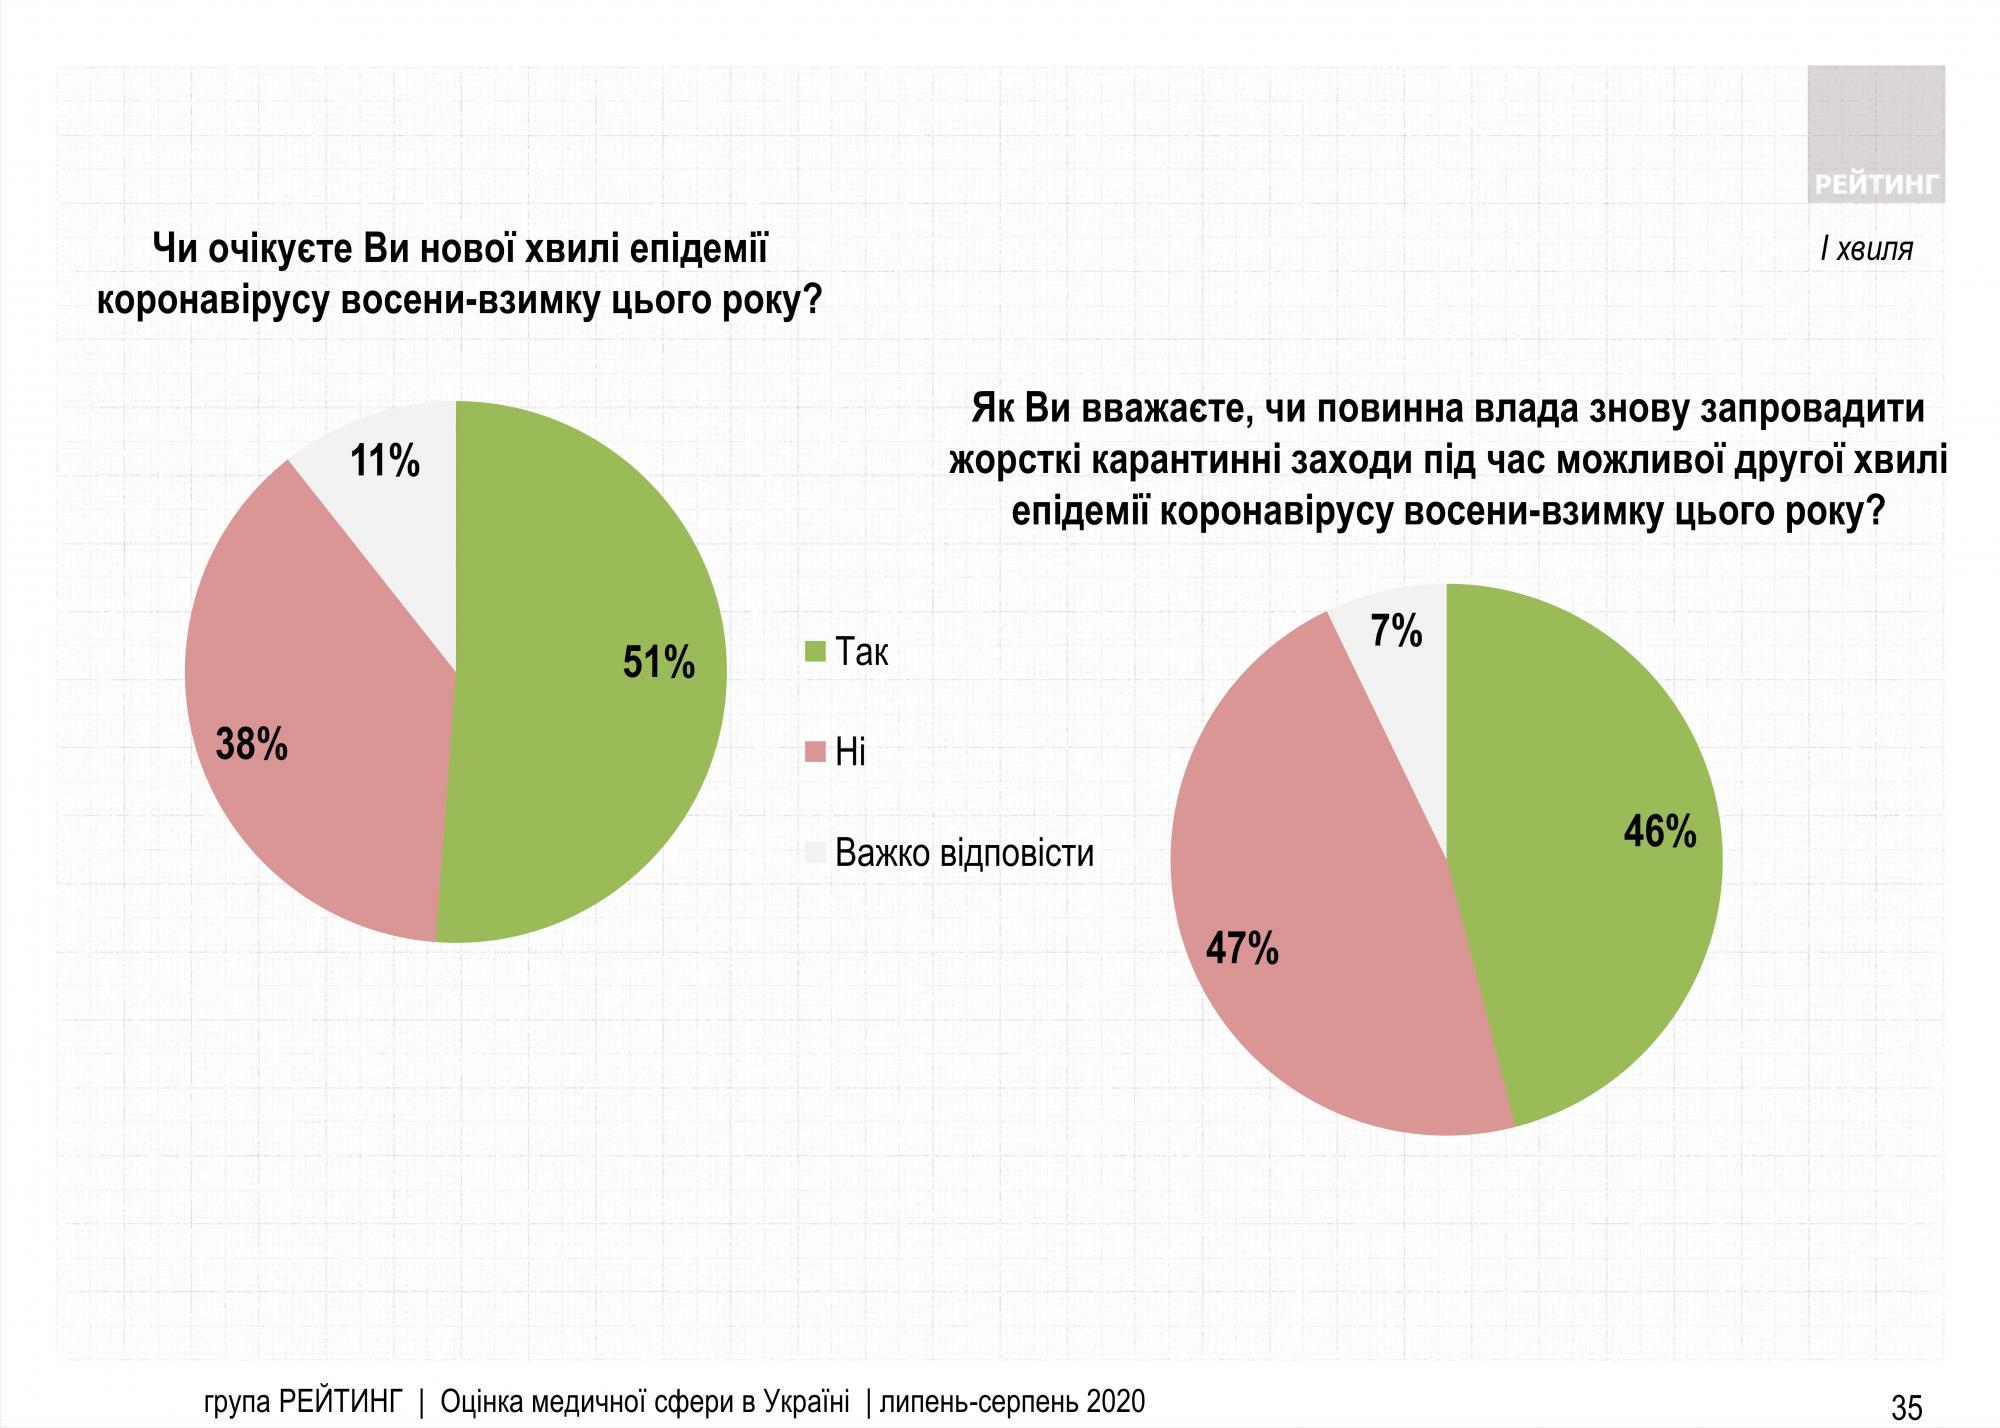 Половина украинцев против жесткого карантина при второй волне эпидемии